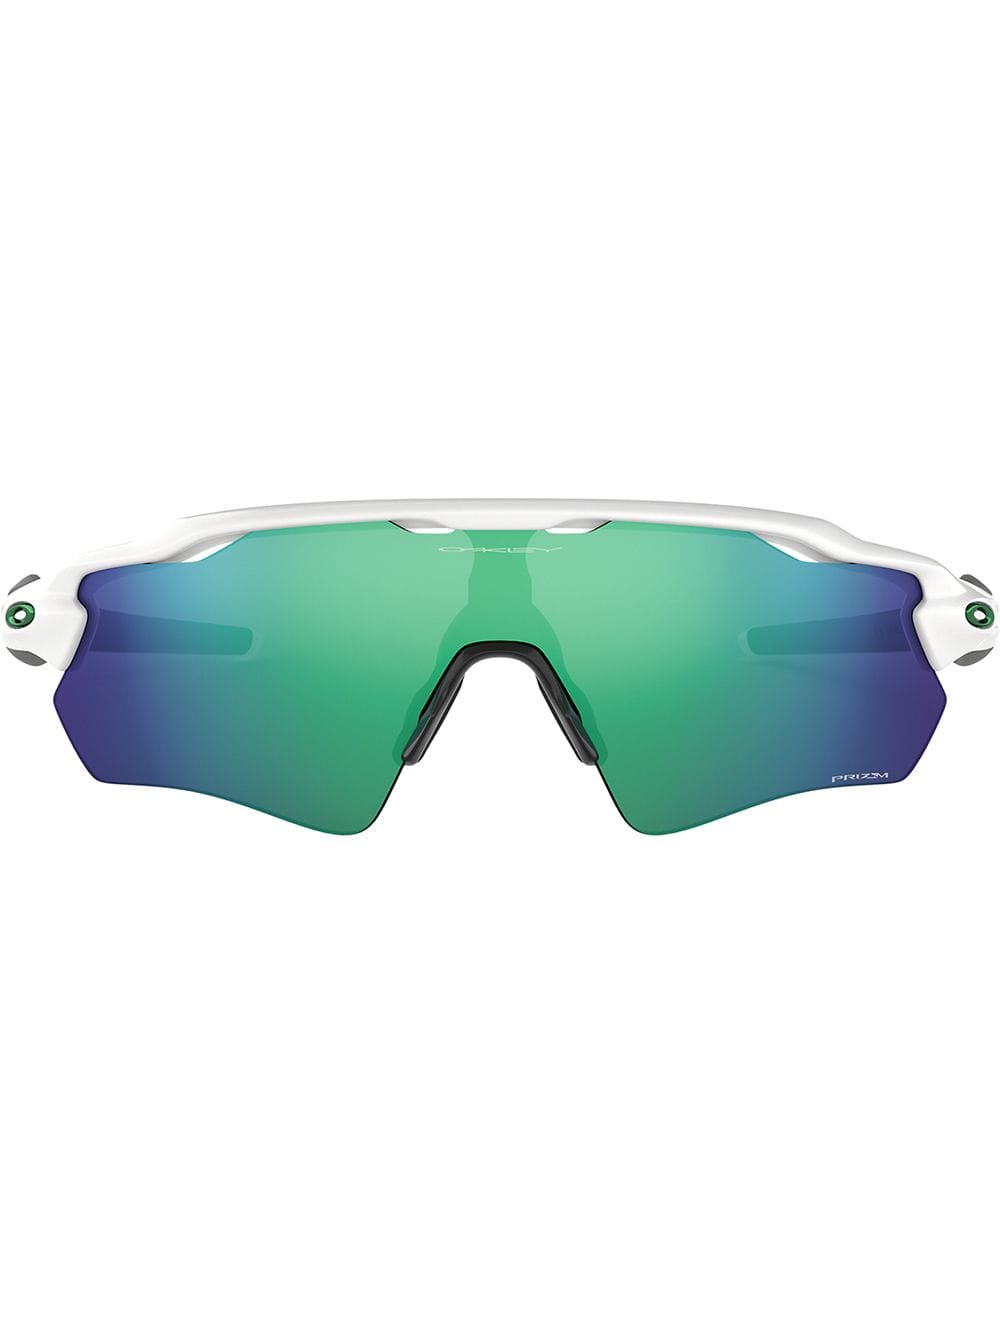 Oakley Radar Ev Path Team Colors Sunglasses In White Modesens In 2020 Oakley Radar Ev Aviator Sunglasses Oakley